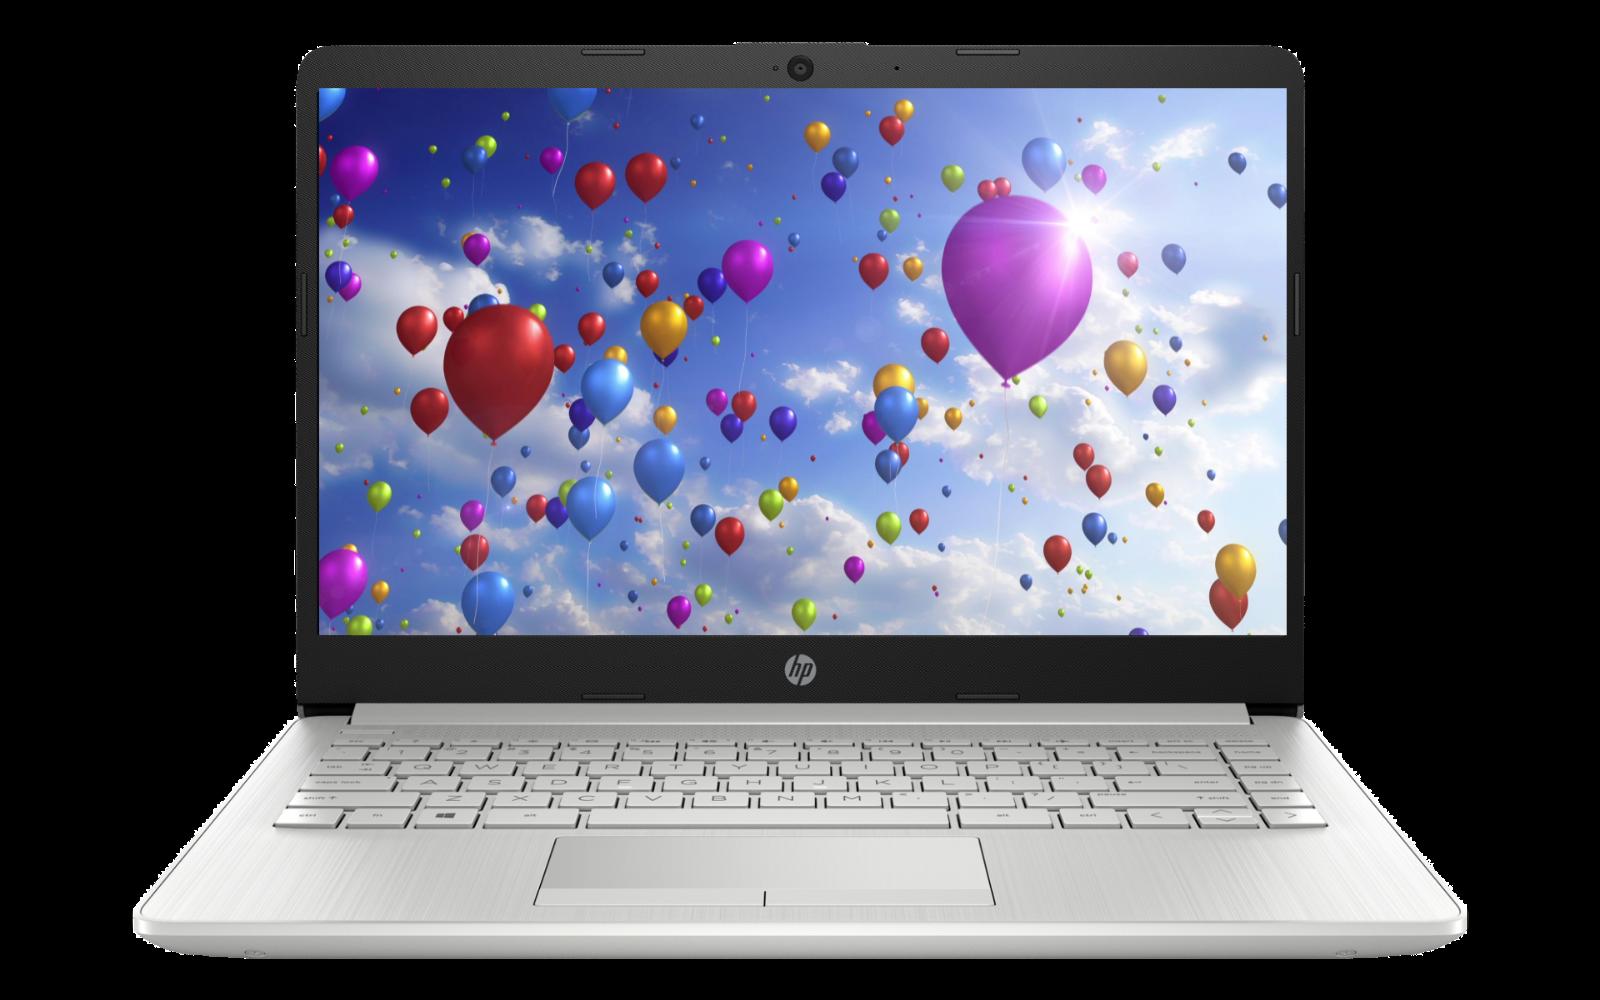 "Laptop Windows - HP 14"" HD laptop AMD Ryzen 3 3.5GHz 1 TB HDD 4GB RAM Mic Webcam Windows 10"